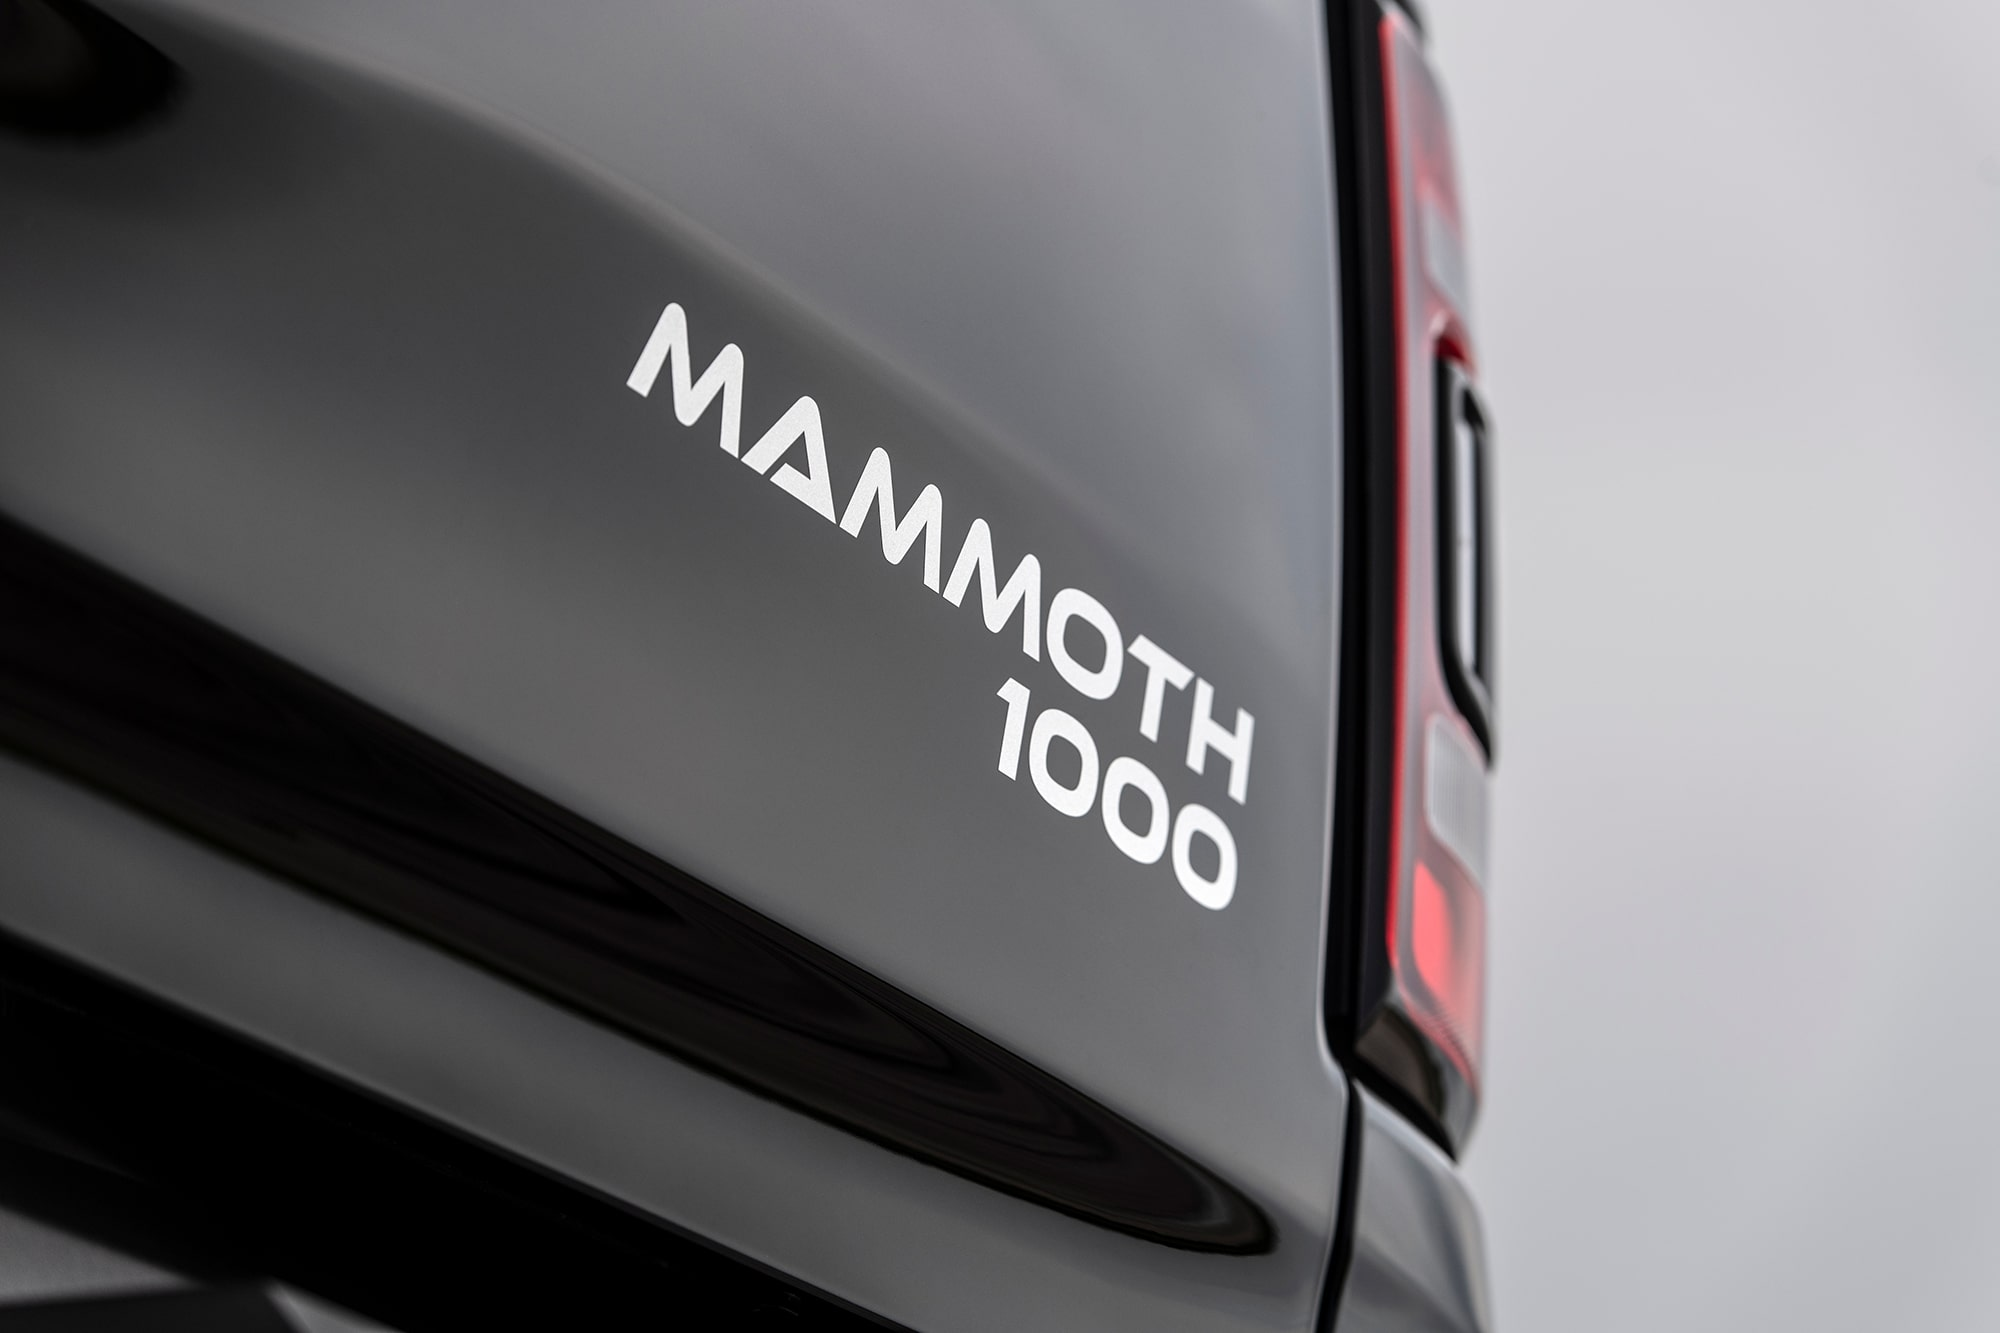 2022 RAM TRX MAMMOTH 1000